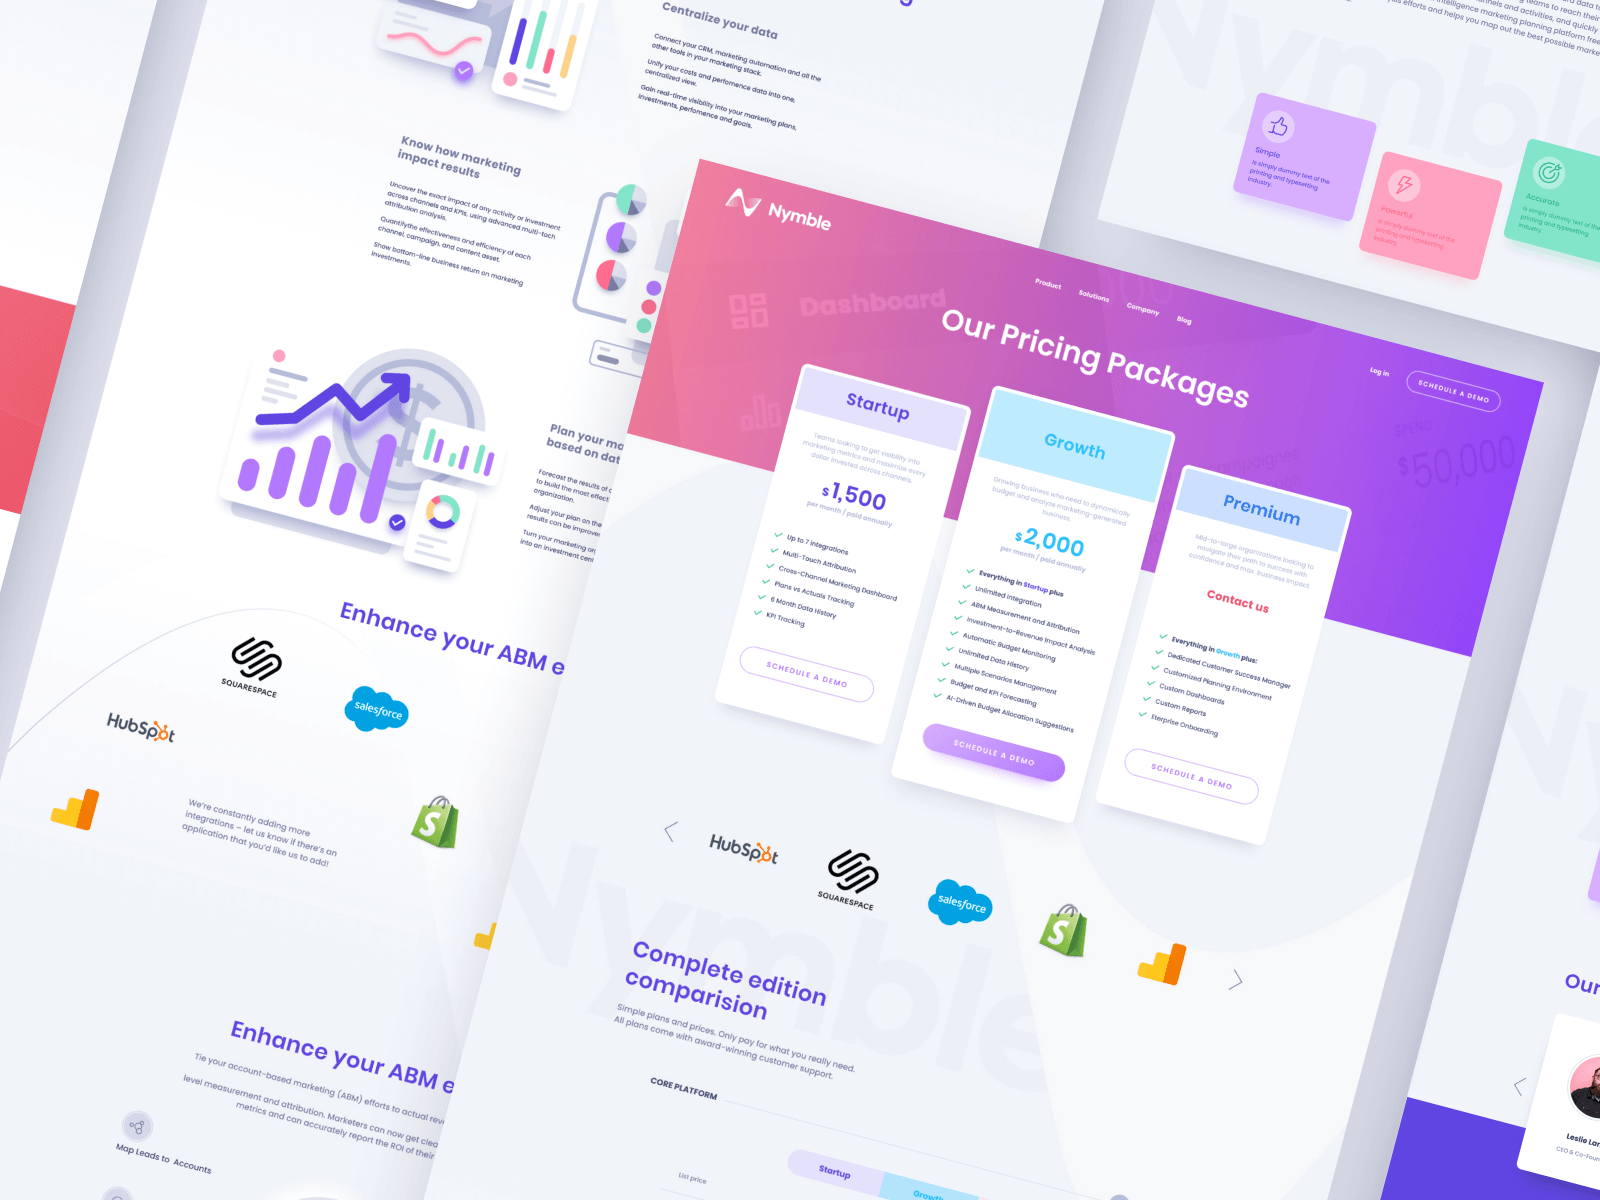 Nymble Website Design